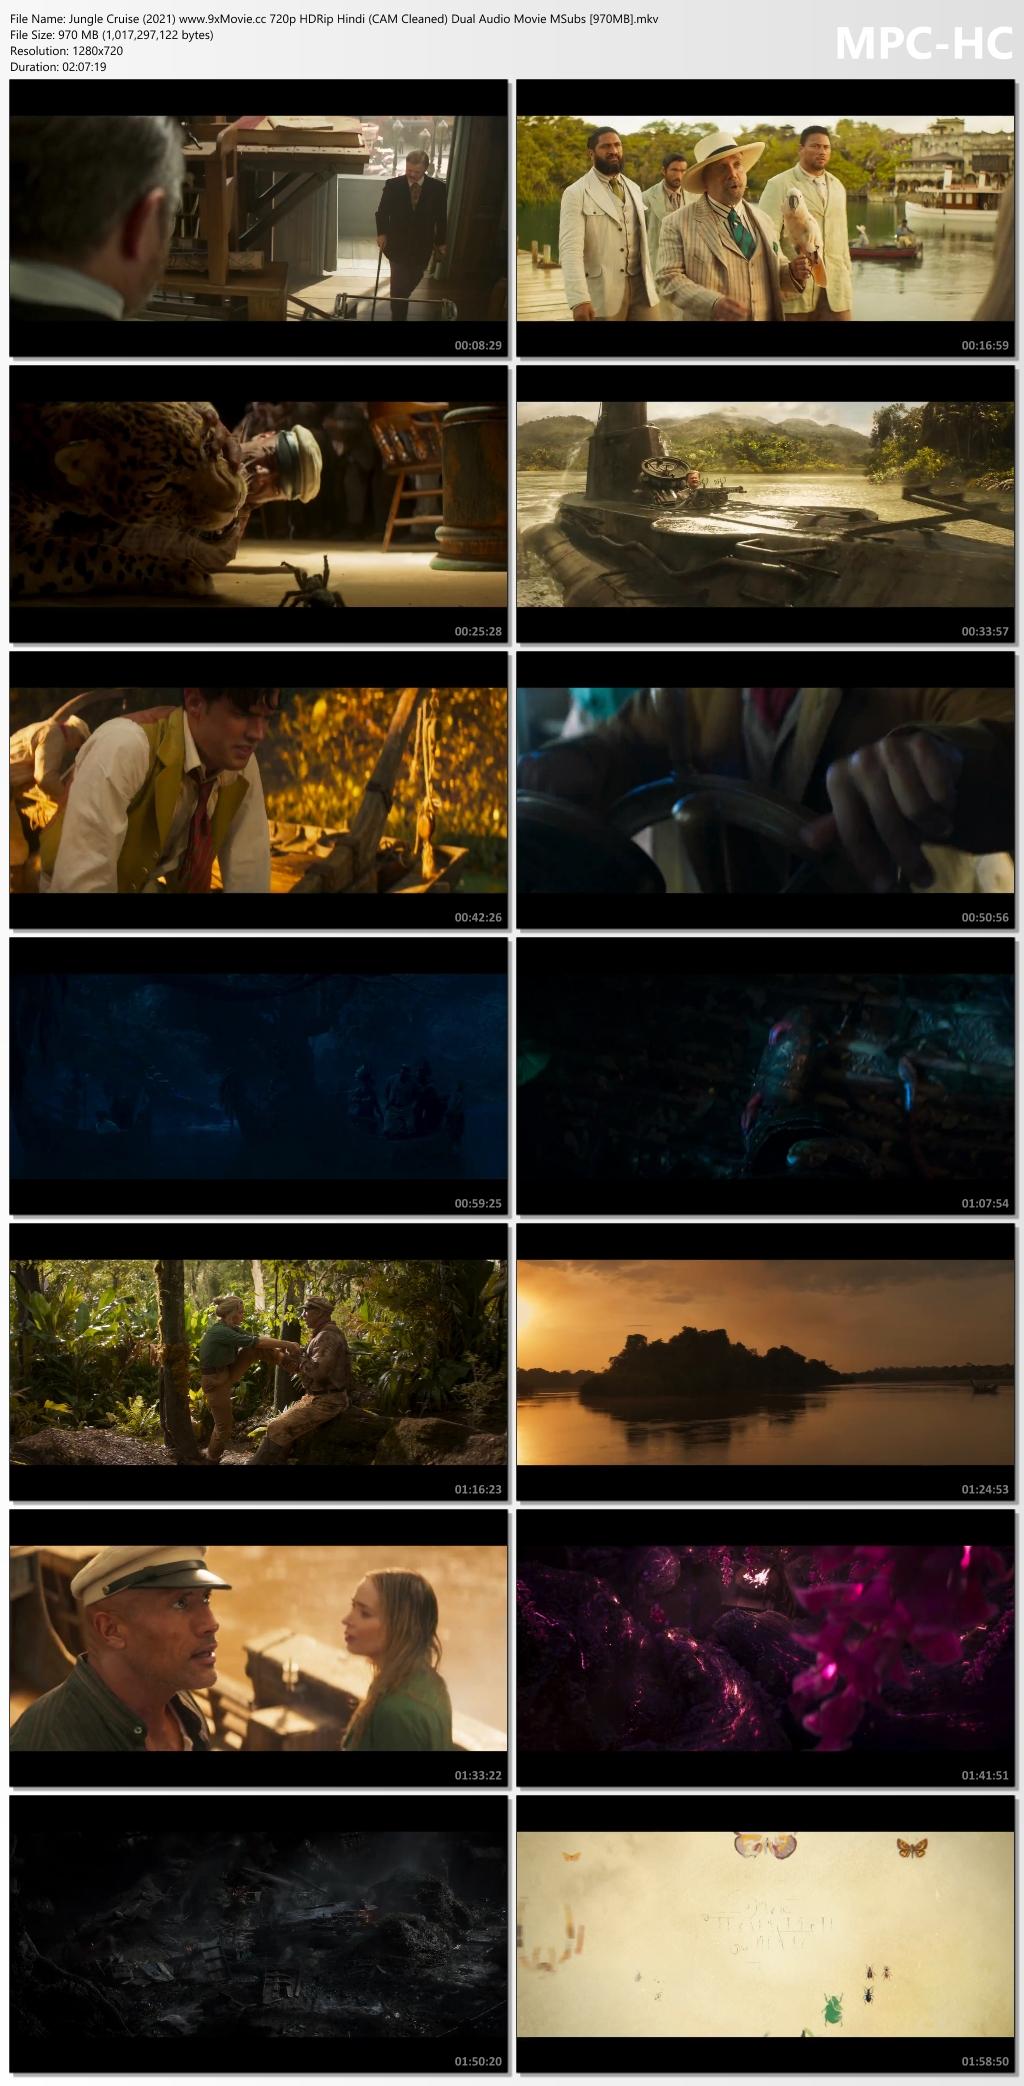 Jungle-Cruise-2021-www-9x-Movie-cc-720p-HDRip-Hindi-CAM-Cleaned-Dual-Audio-Movie-MSubs-970-MB-mkv